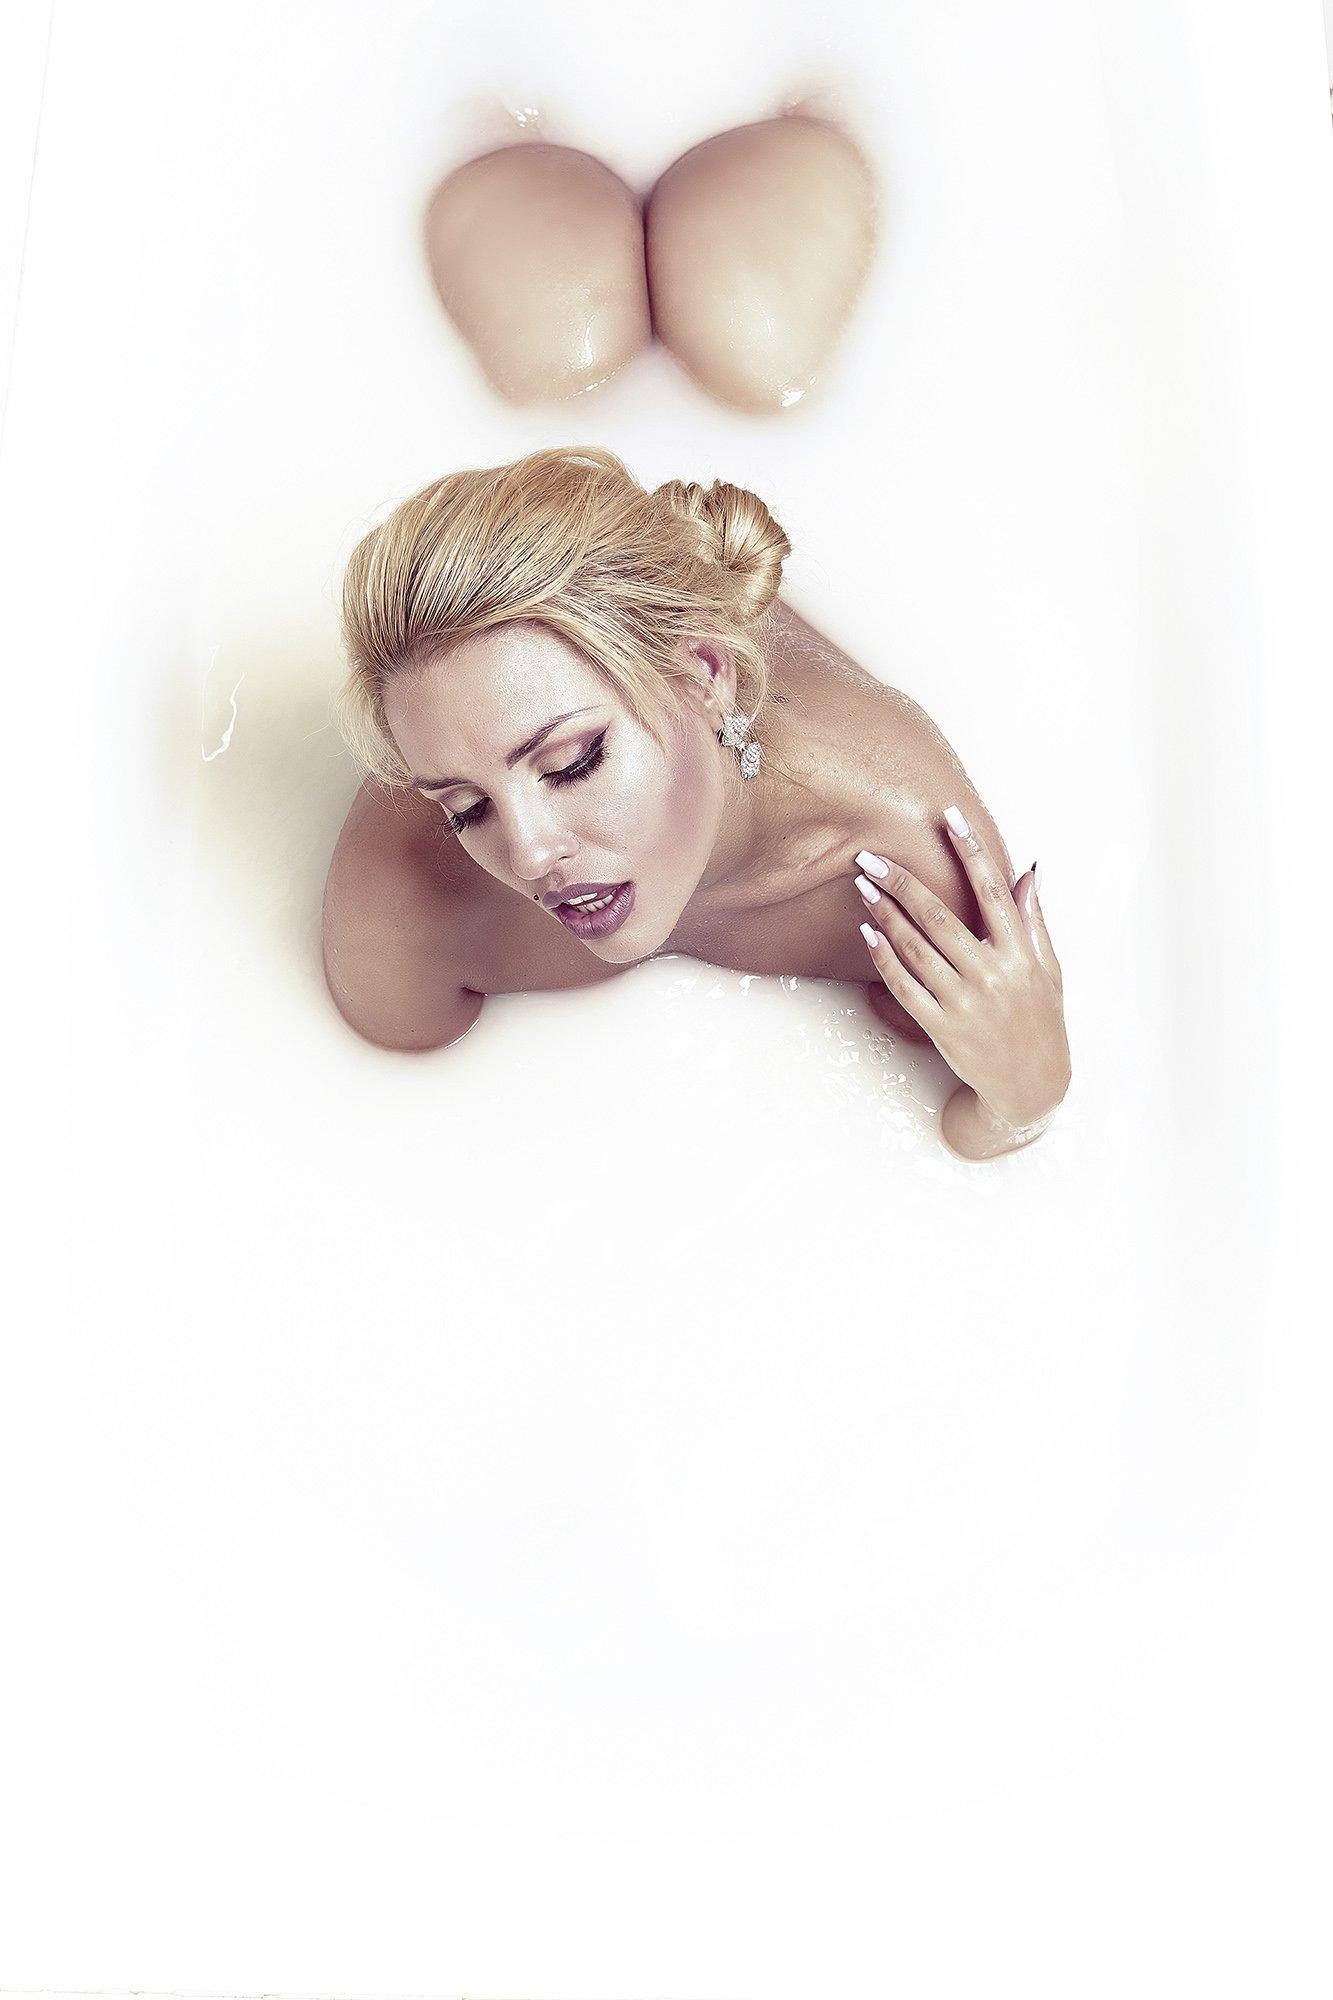 fashion, nude, white, model, girl, girls, woman, sexy, sensual, portrait, , Max Solve